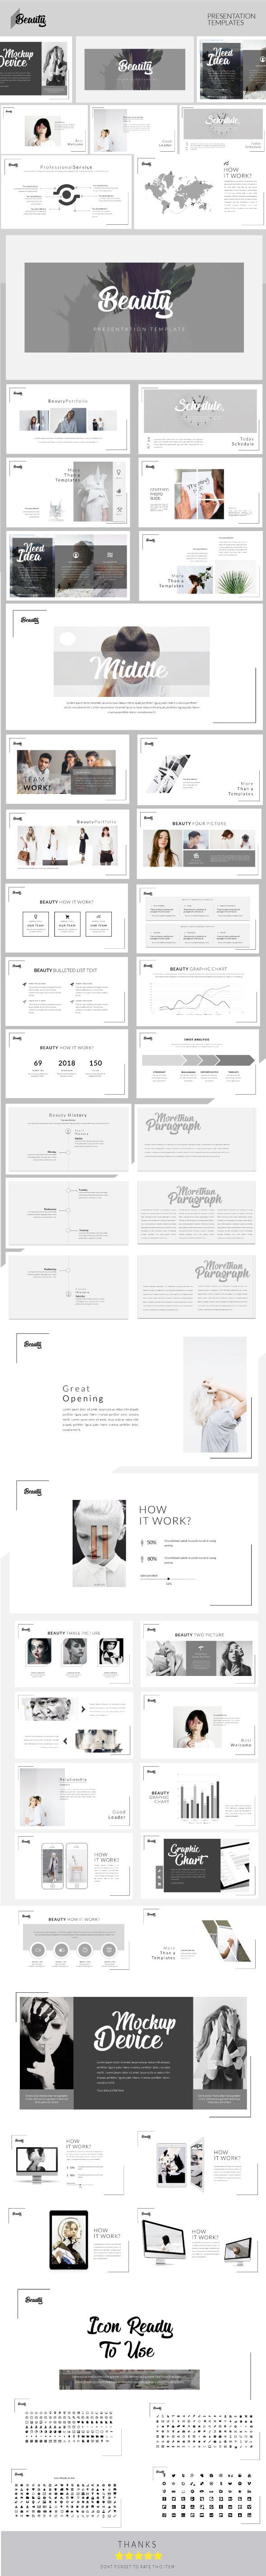 Beauty - Multipurpose Presentation Templates - Business PowerPoint Templates